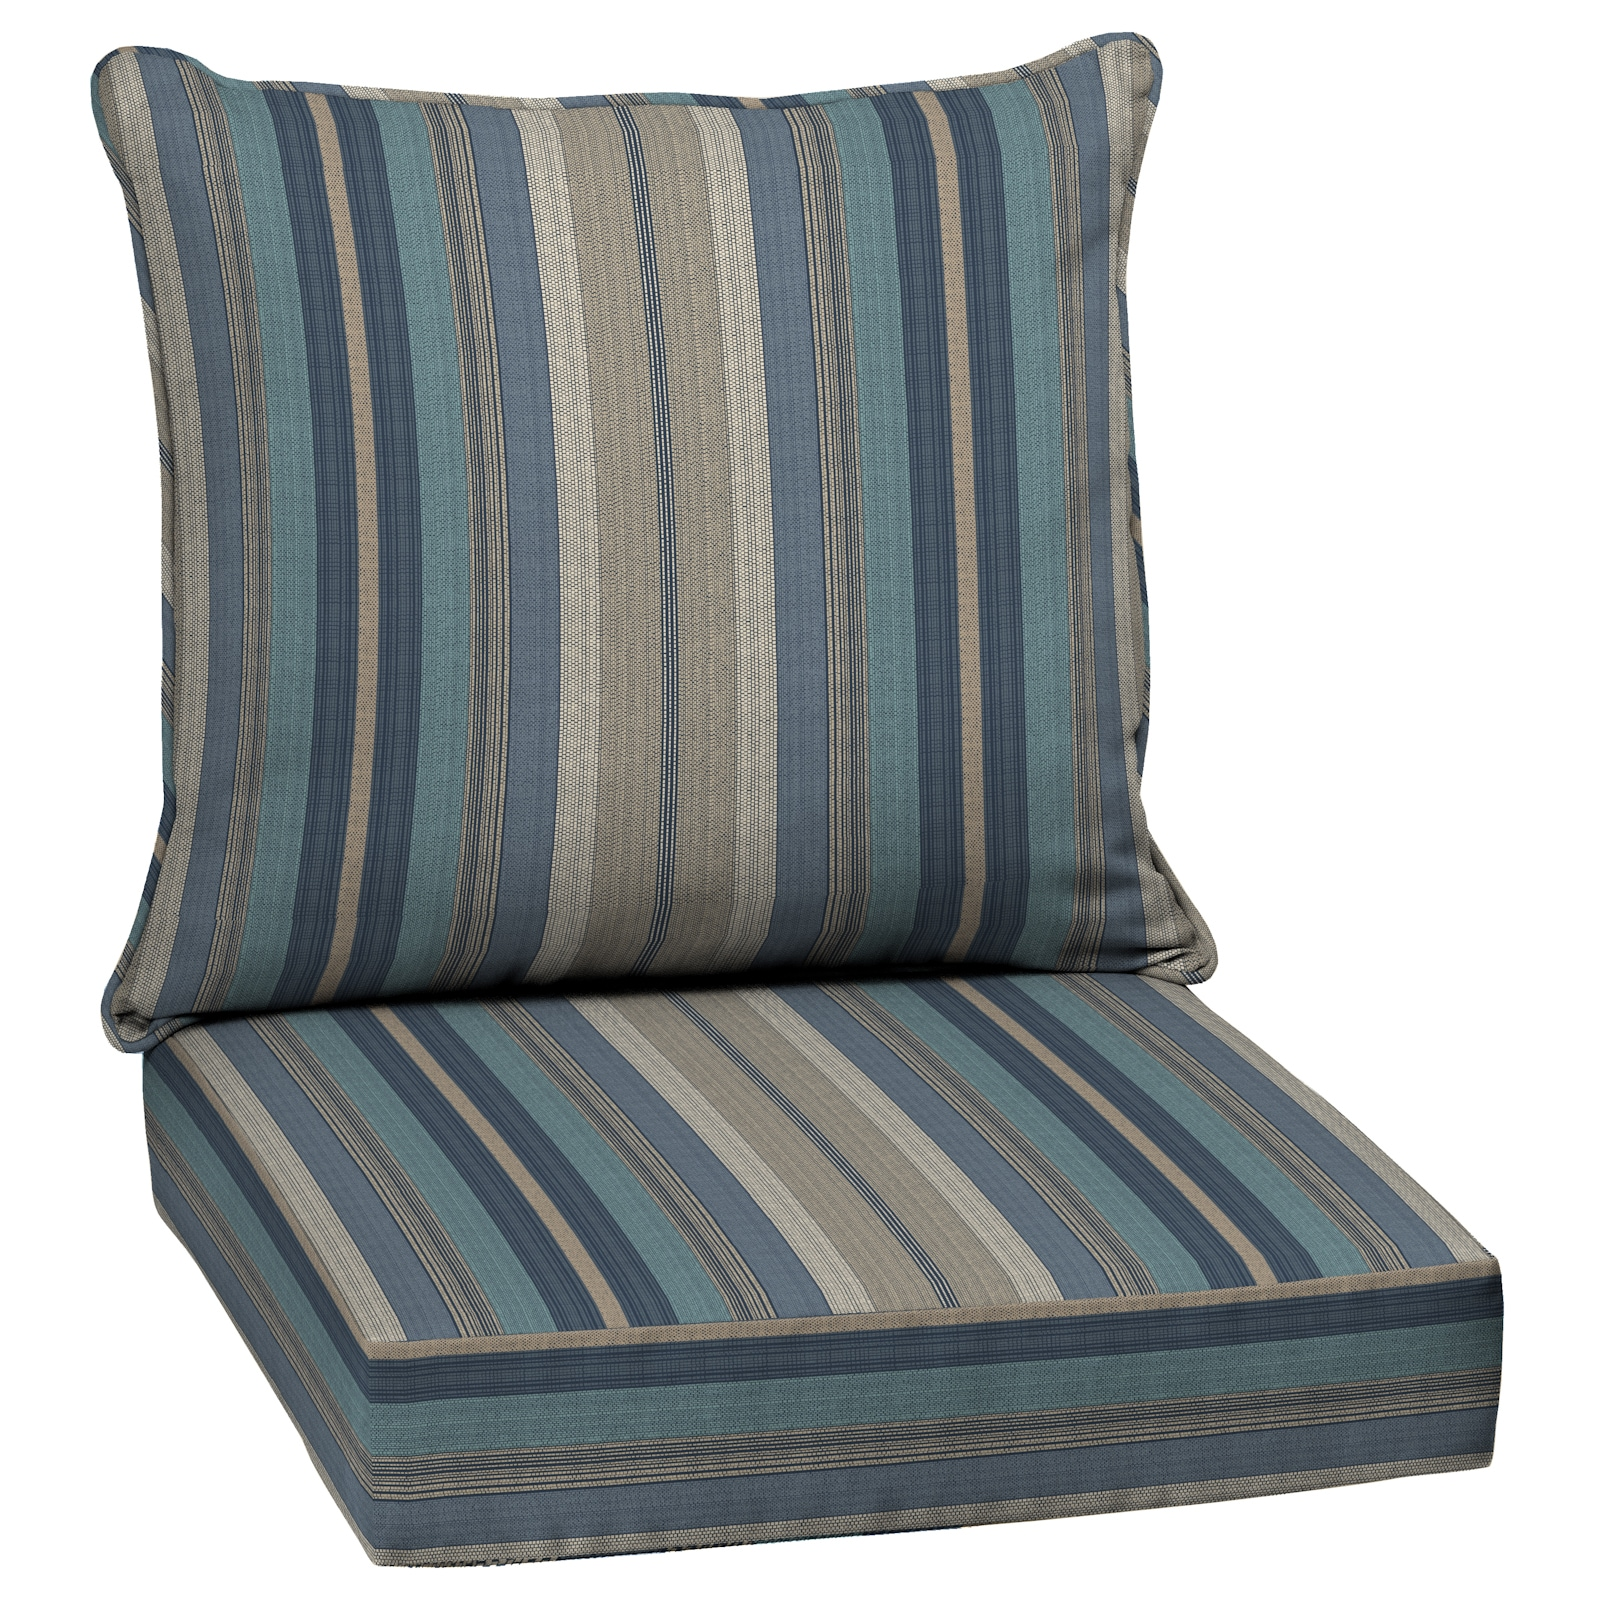 allen + roth 20 Piece Deep Seat Patio Chair Cushion in the Patio ...